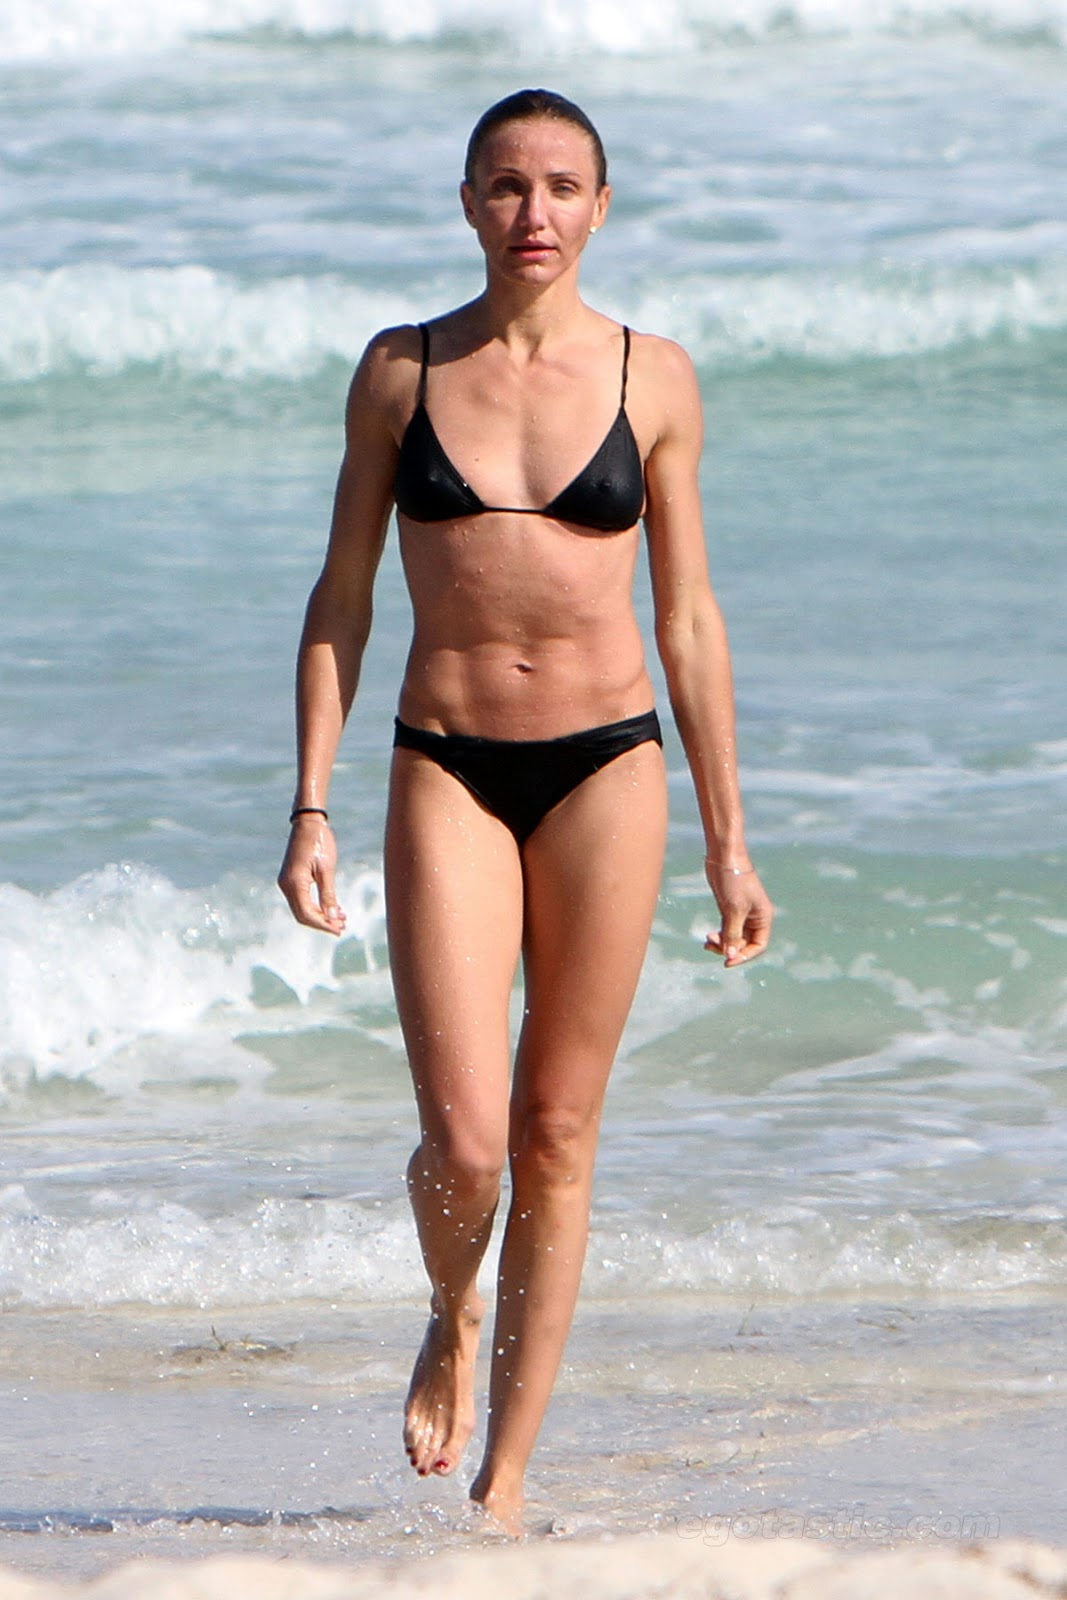 Cameron diaz hot bikini